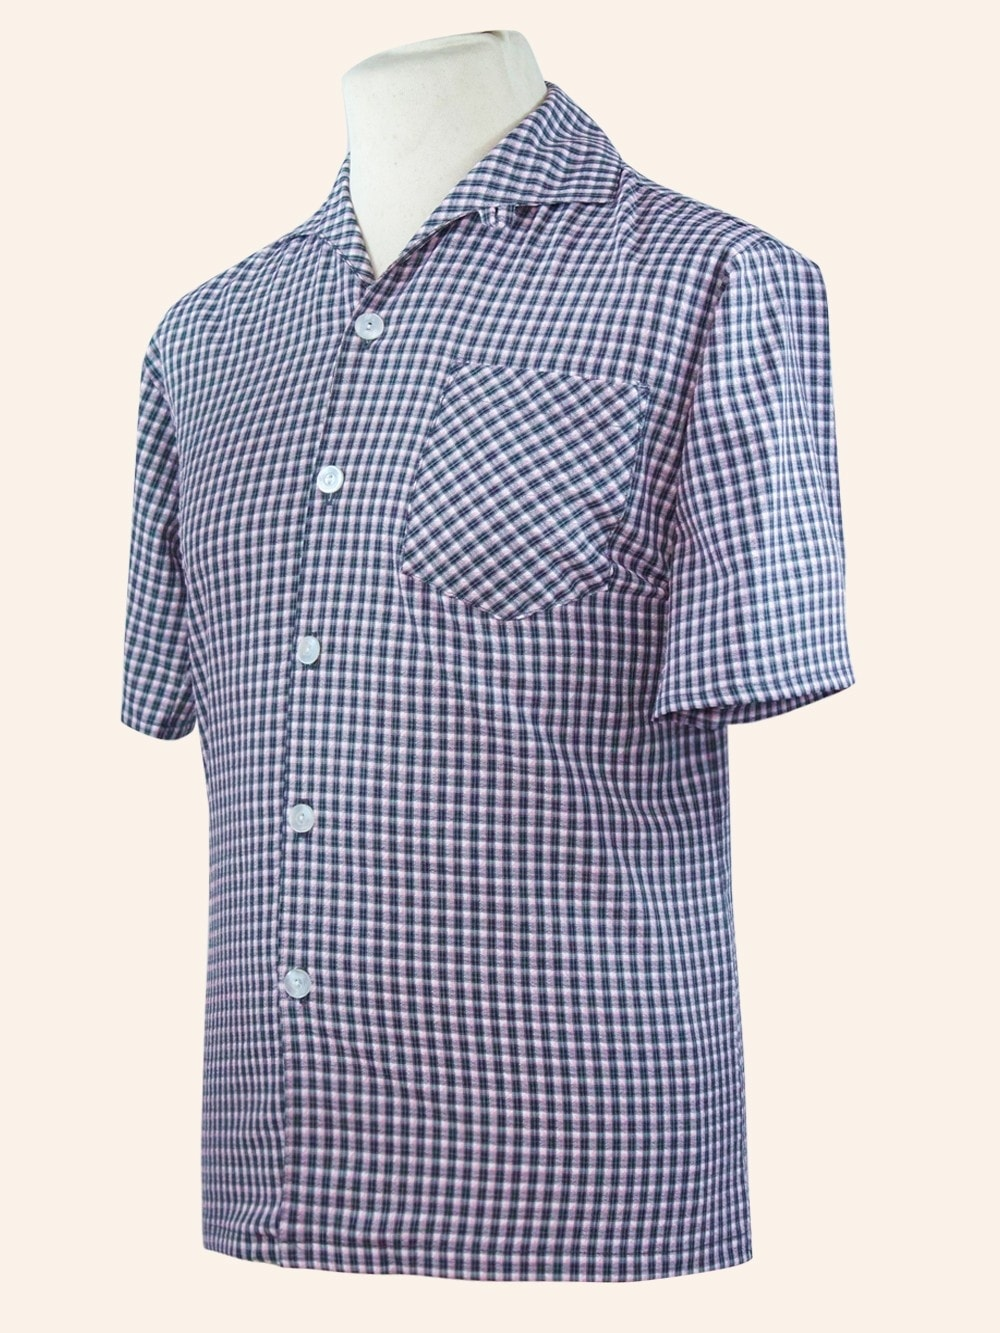 Men 39 S Short Sleeved Pink Grey Check Shirt From Vivien Of